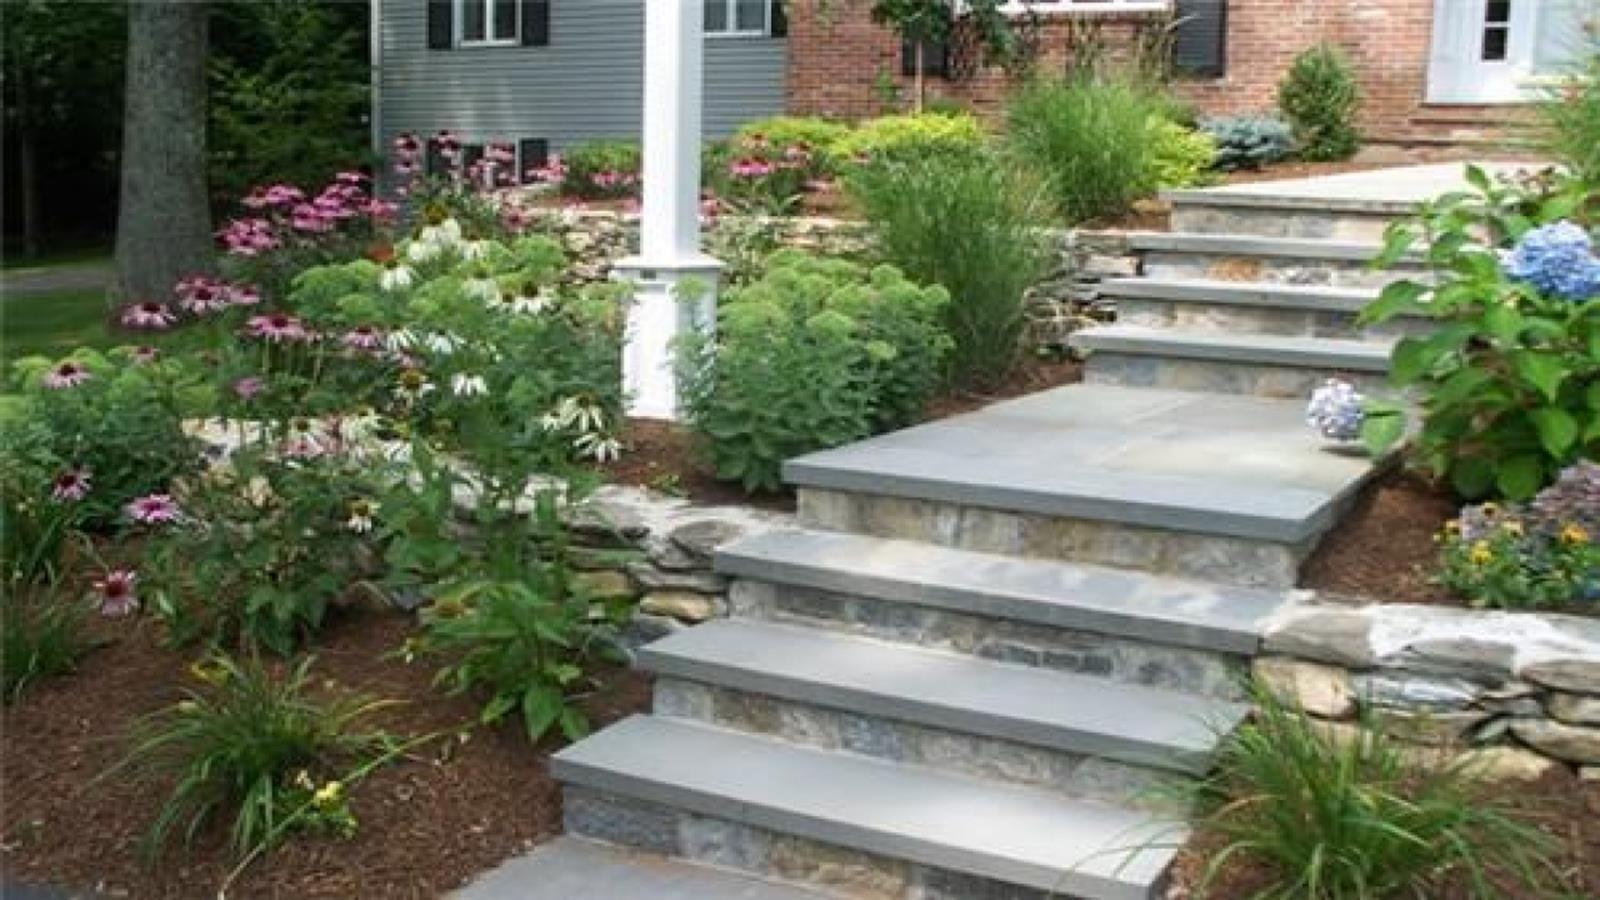 Front Walkway Landscaping Ideas 9 | Front walkway ...